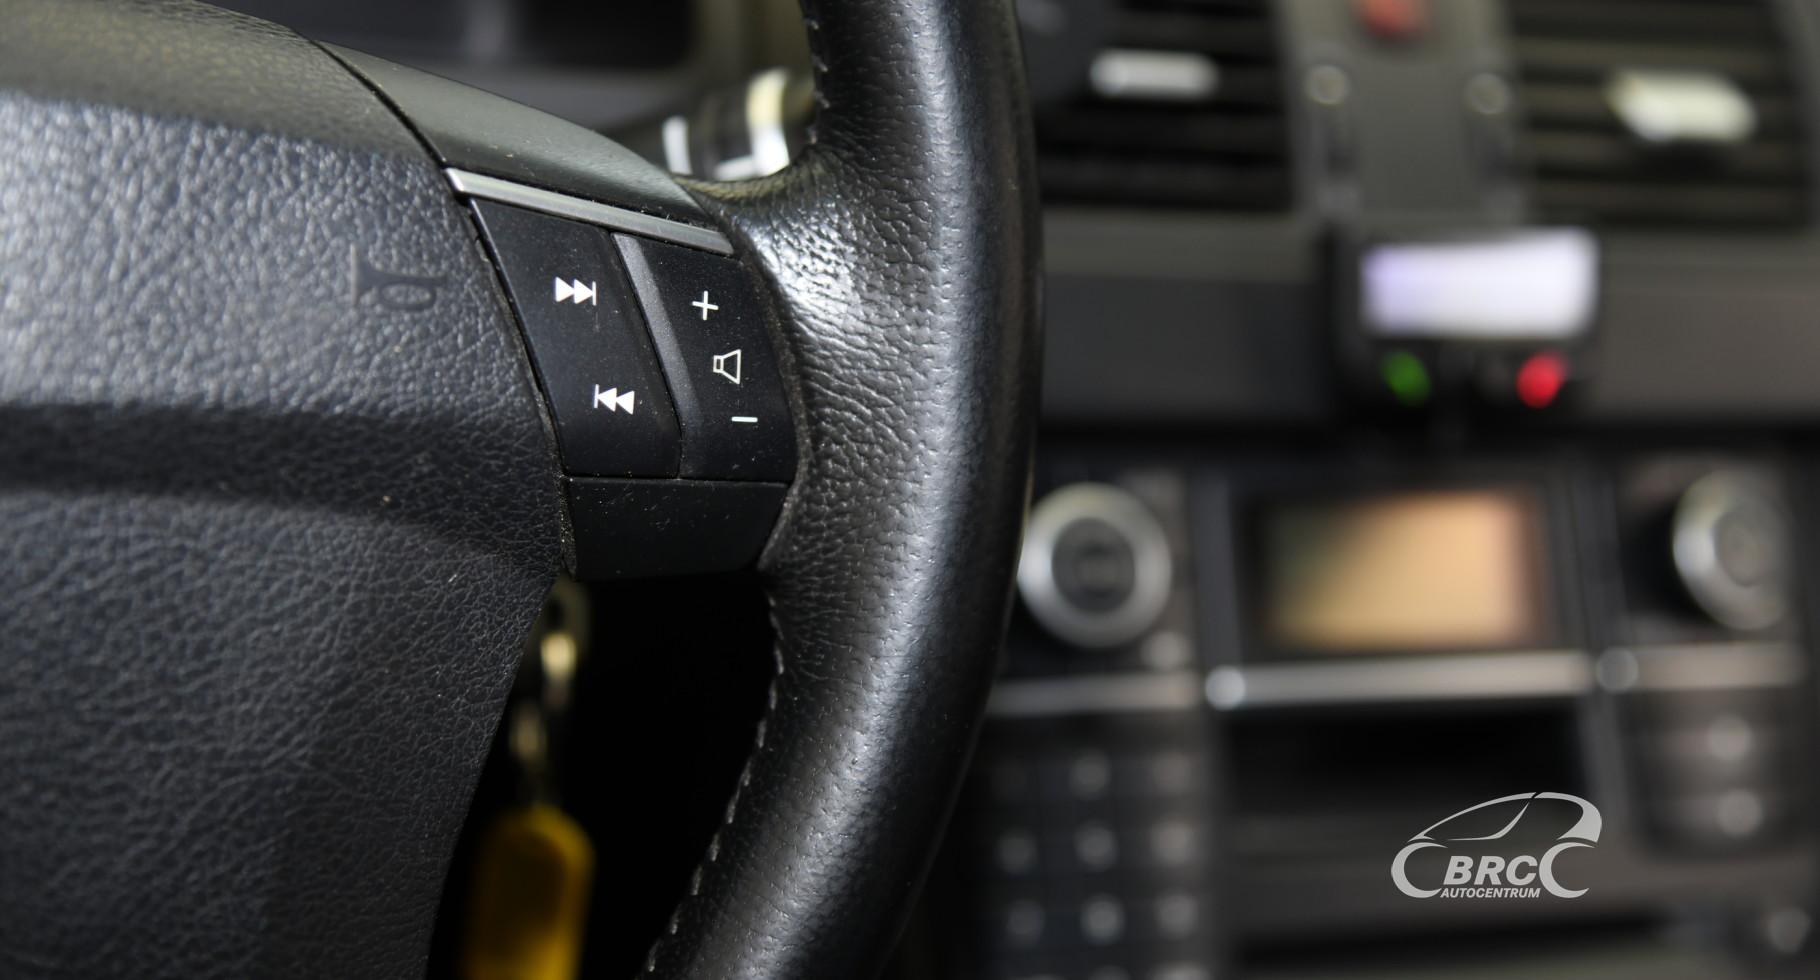 Volvo XC 90 2.4 D5 Sips AWD Automatas